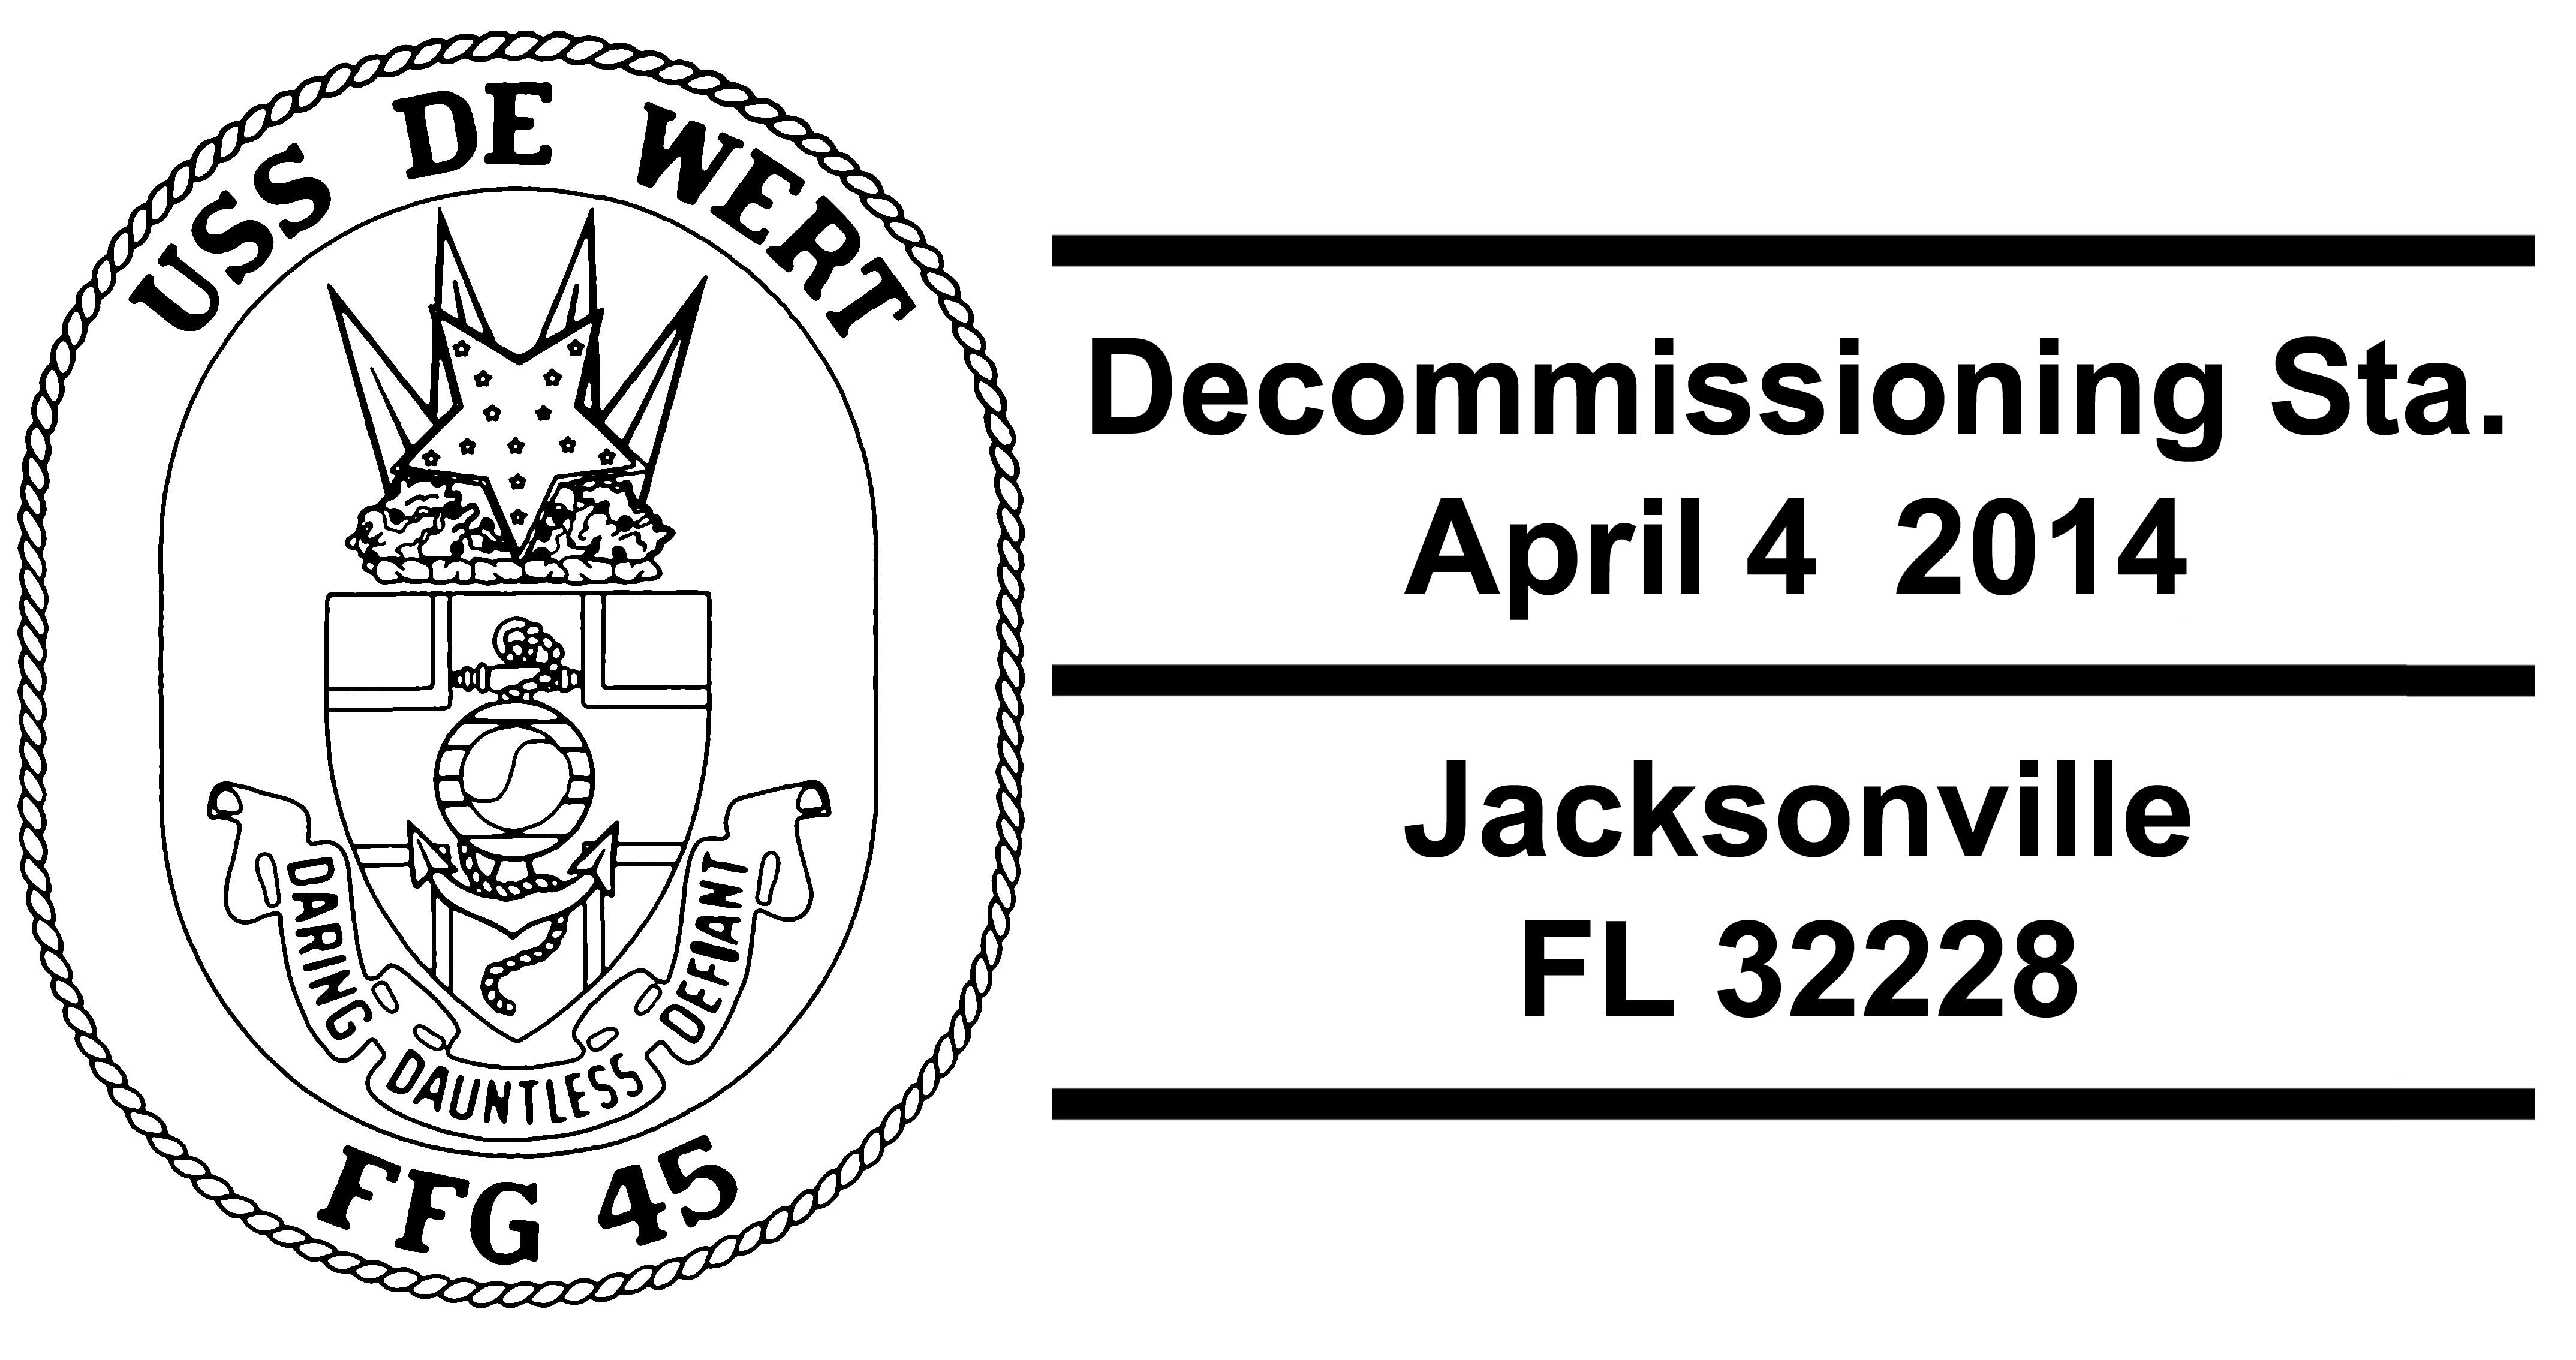 Sonderpoststempel USS DE WERT FFG-45 Decommissioning Design: Wolfgang Hechler